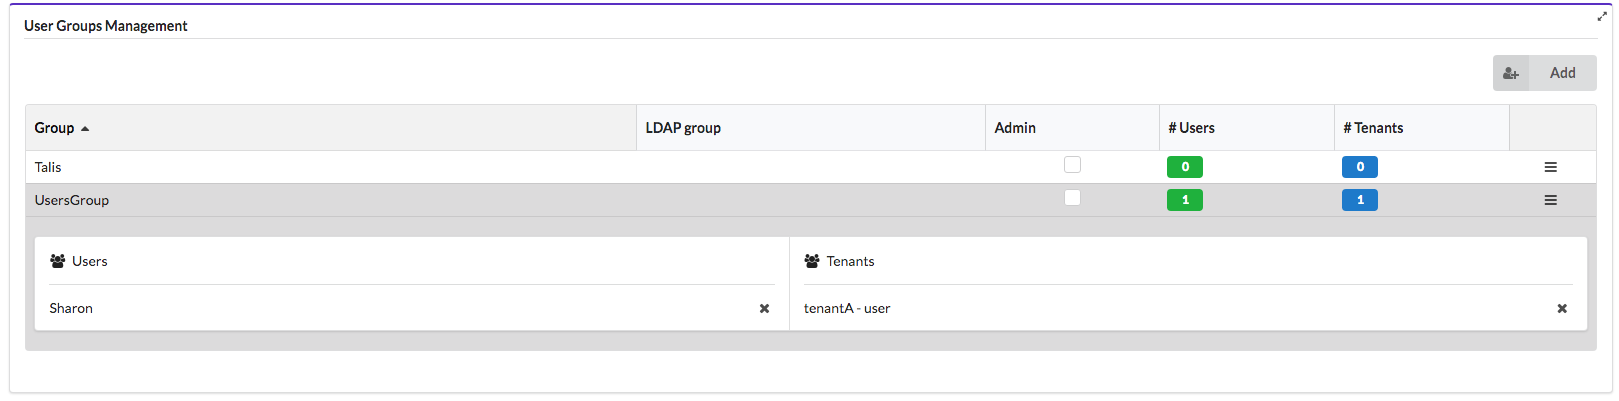 User Group Management   Cloudify Documentation Center